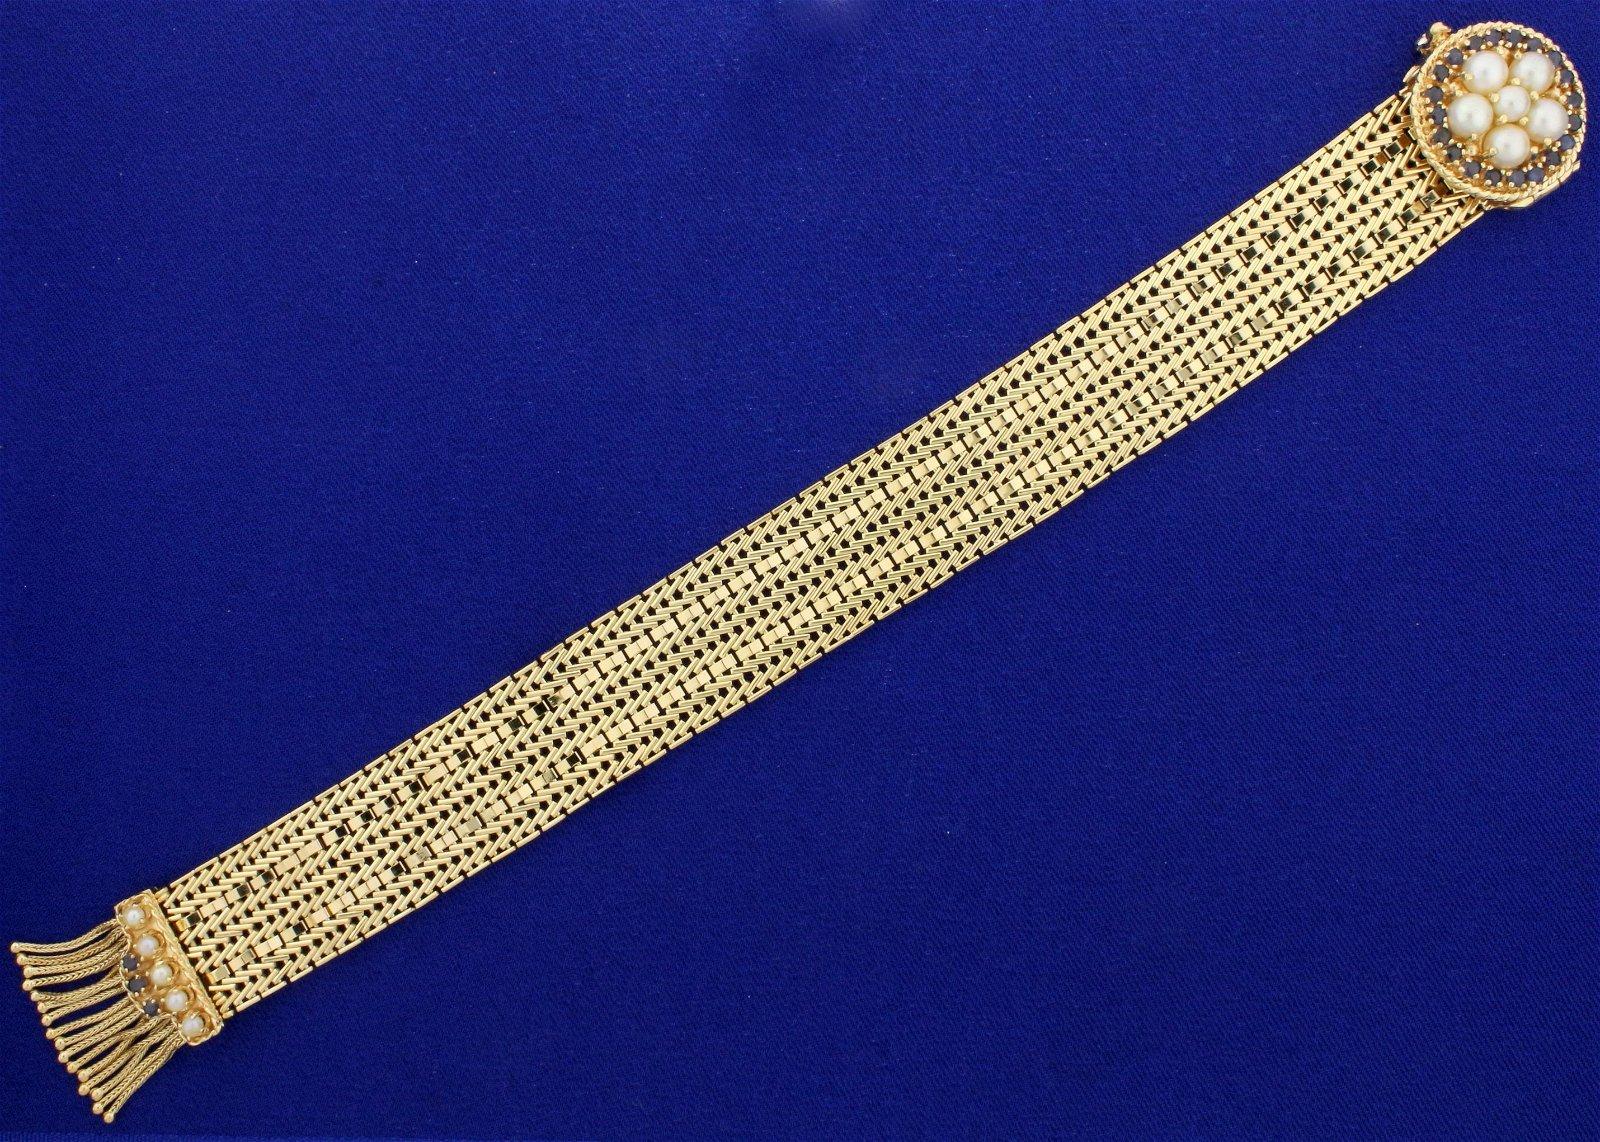 Vintage Victorian Adjustable Mesh Bracelet with Pearls